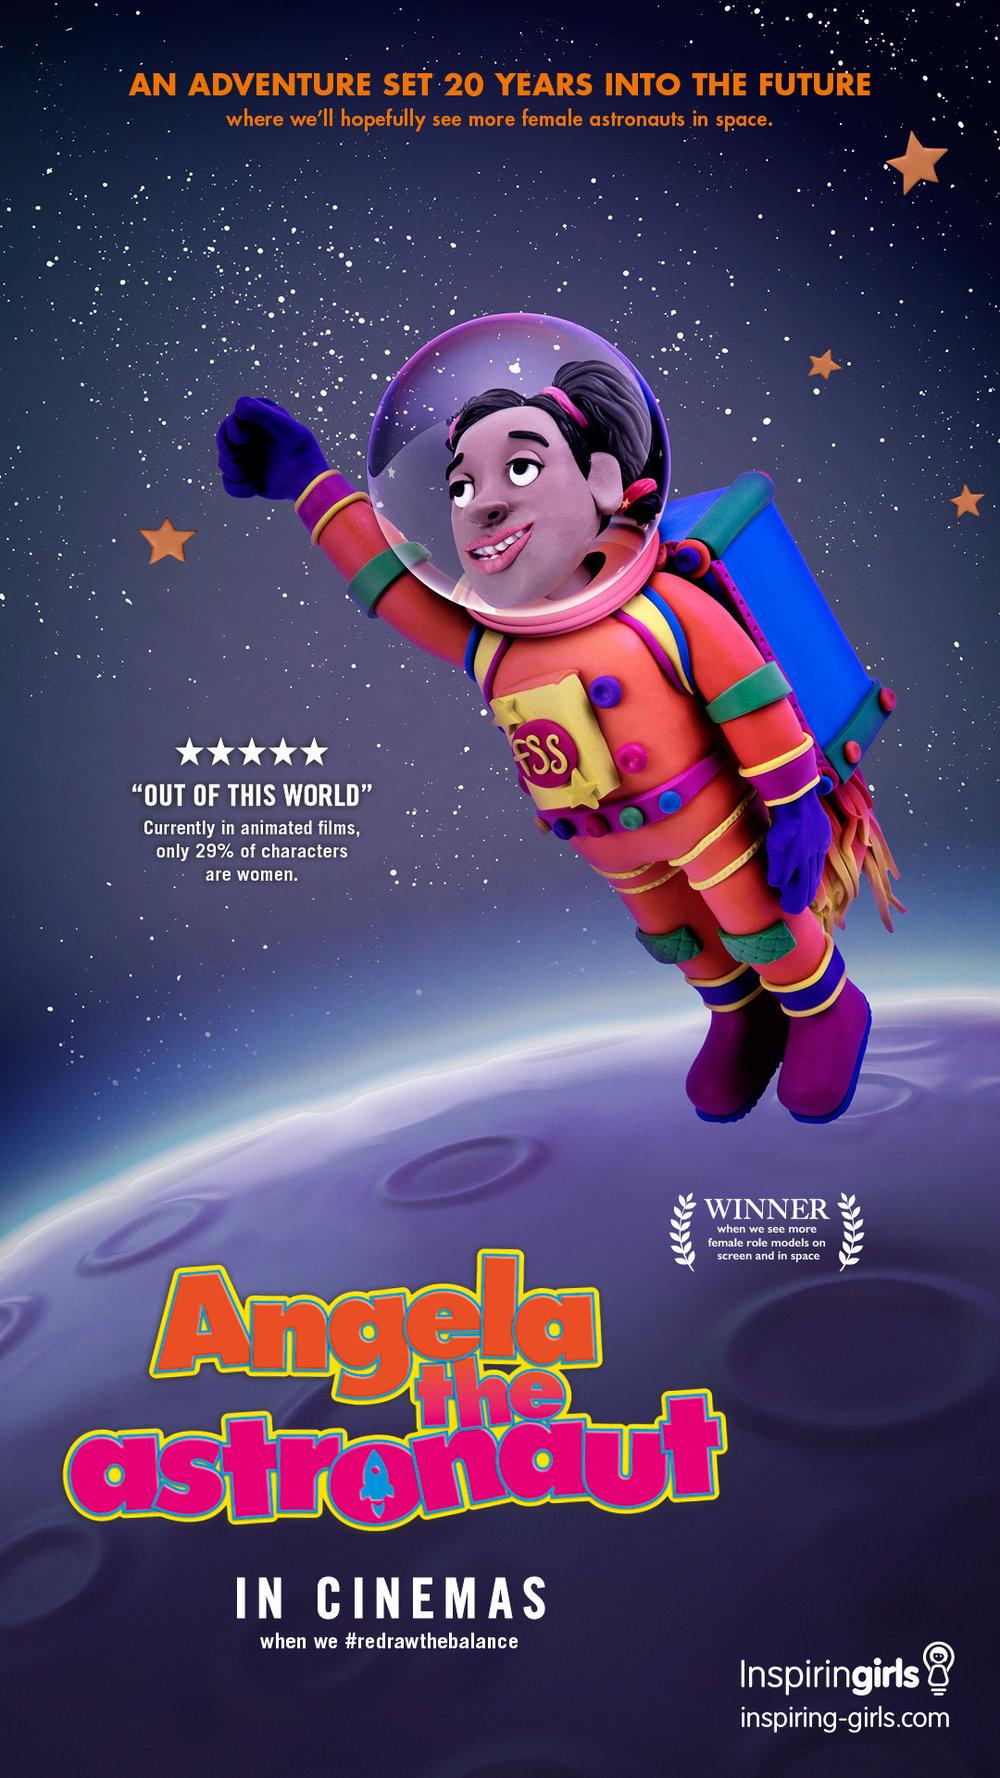 16152_7a0103_Angela_Astronaut_D6$.jpg